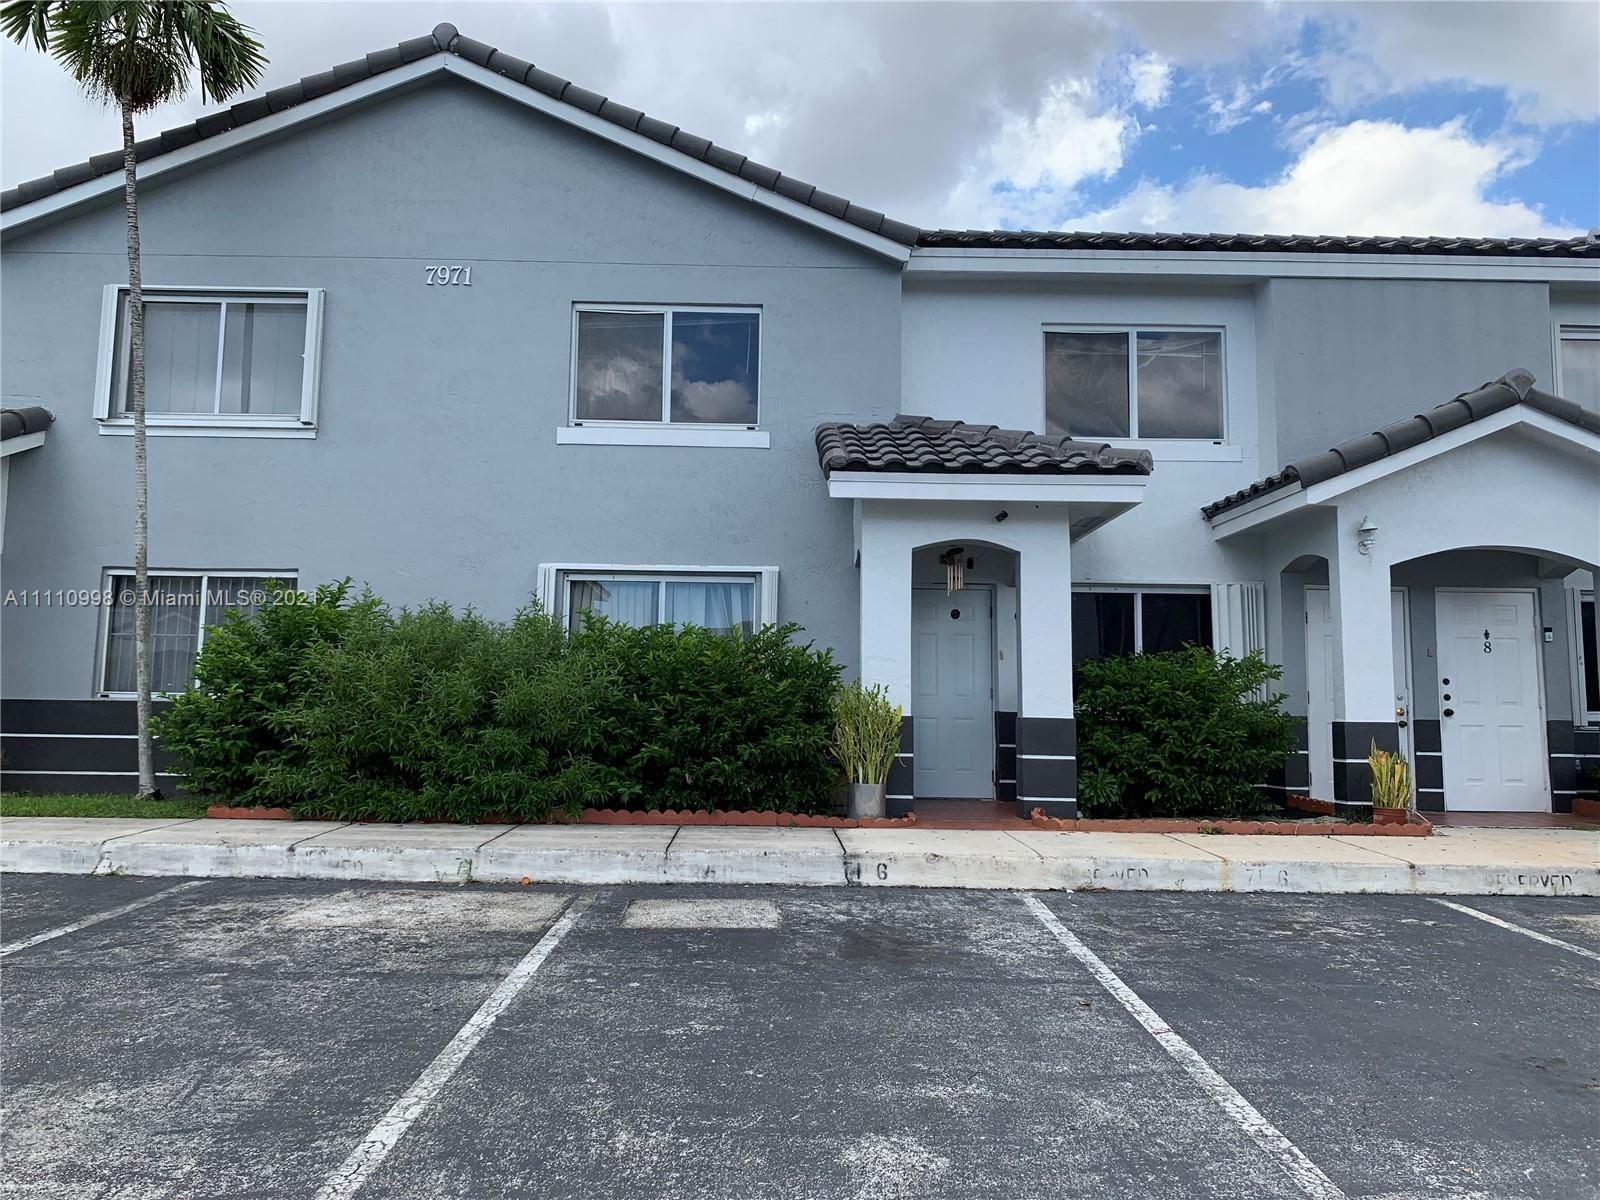 7971 SW 152nd Ave #1505, Miami, FL 33193 - #: A11110998